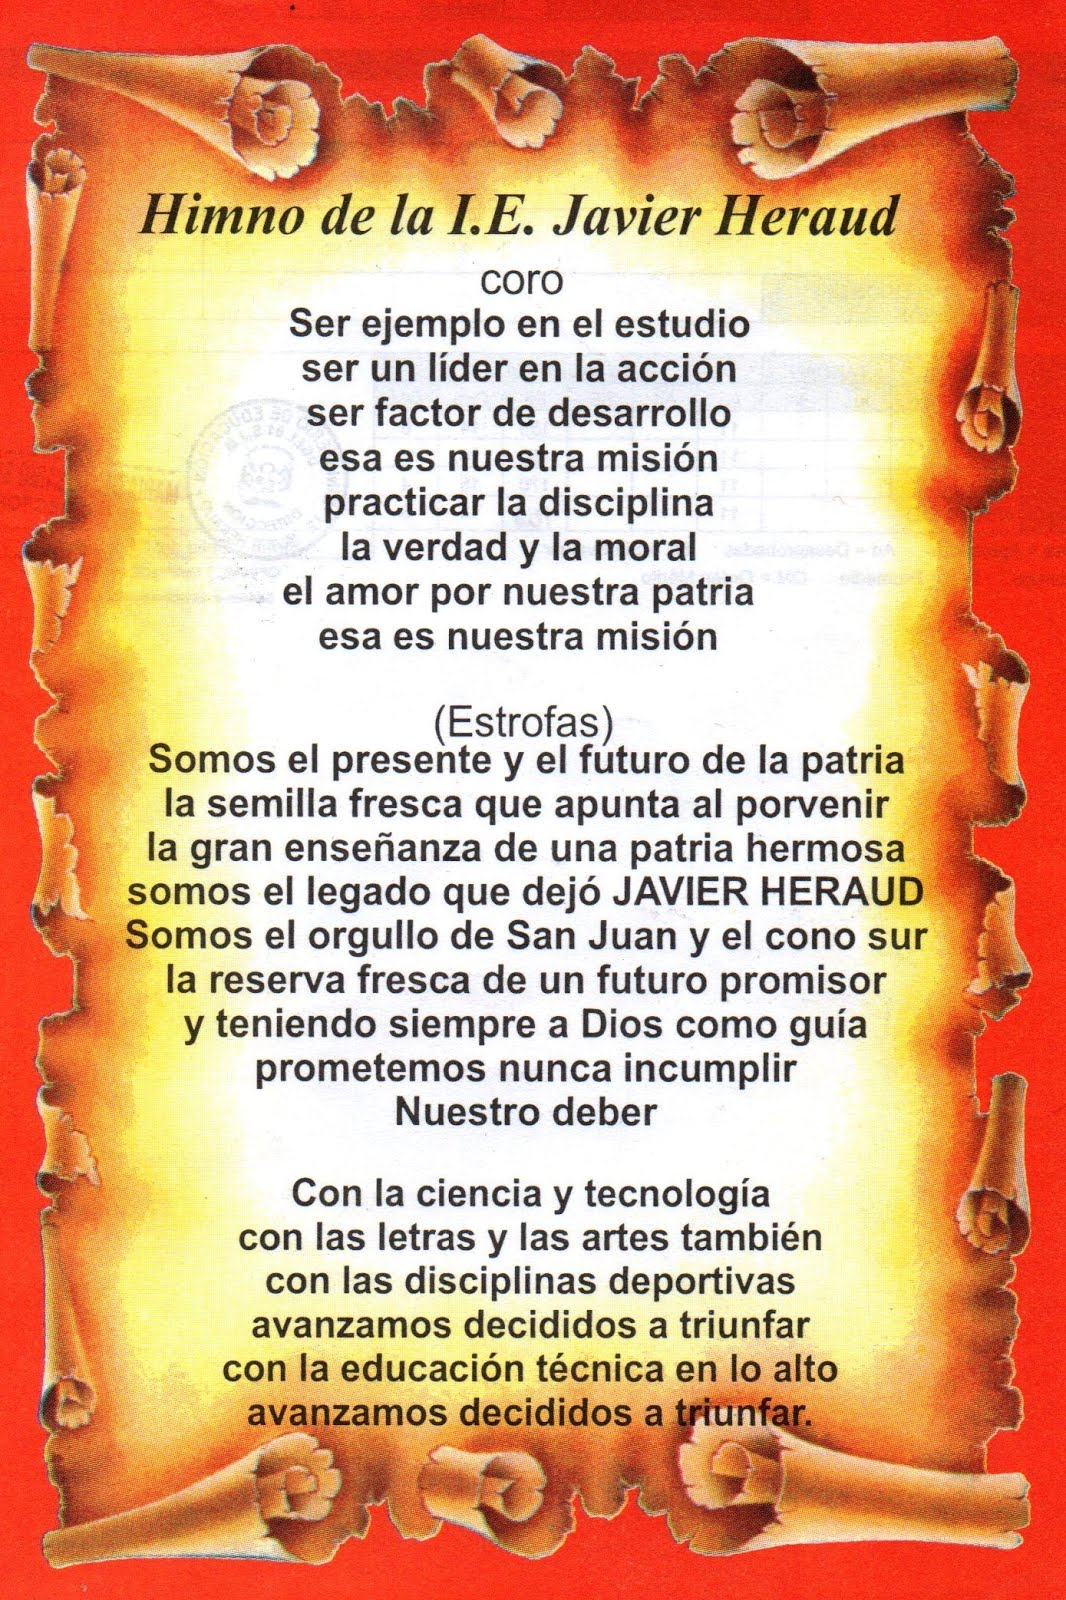 Himno Institución Educativa Javier Heraud